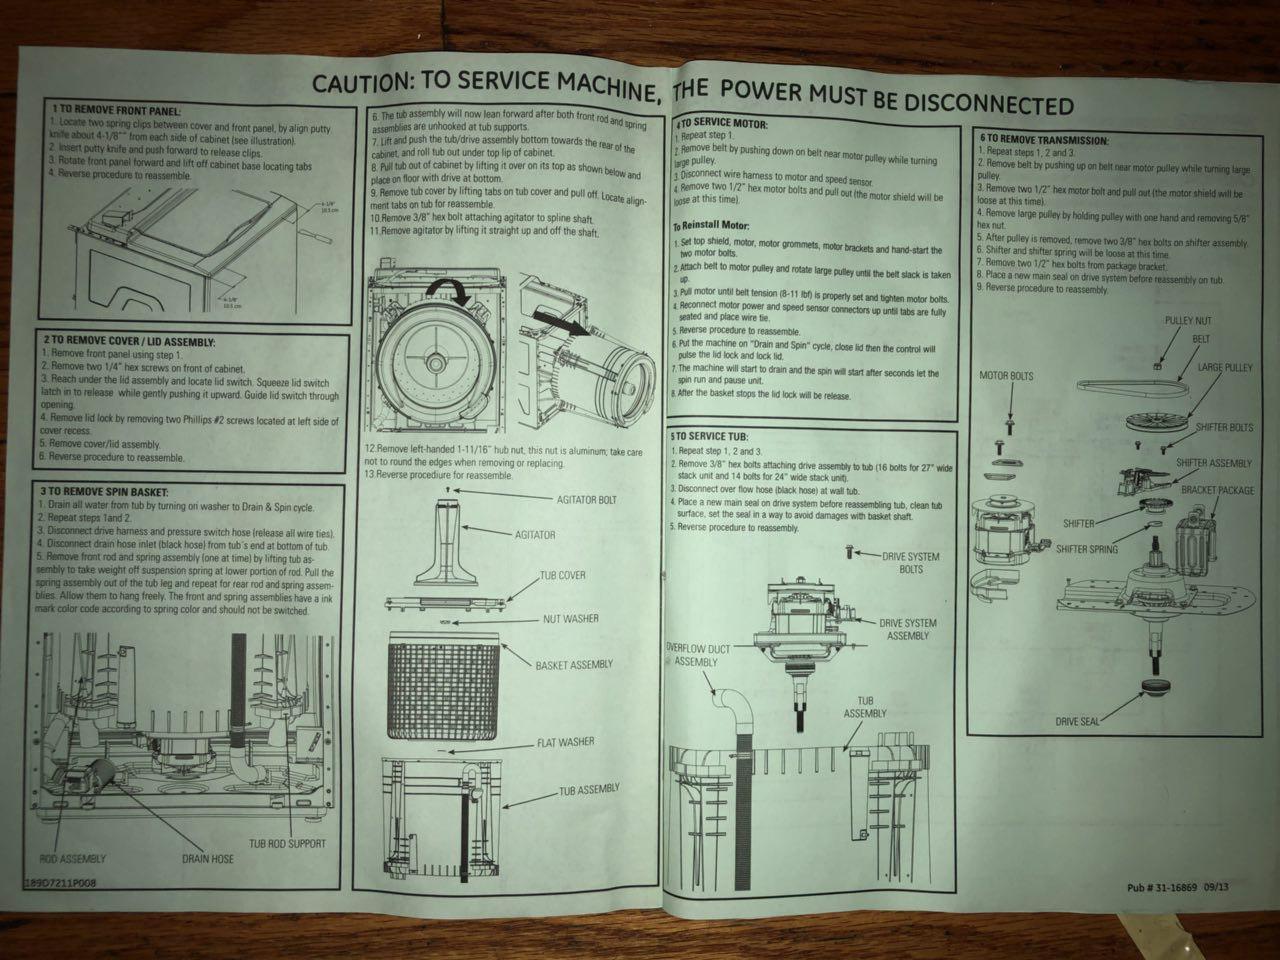 Ge Washerdryer Combo Model Gud27gssj0ww Service Manual Iskander Agitator Basket And Tub Diagram Parts List For Whirlpool Washer